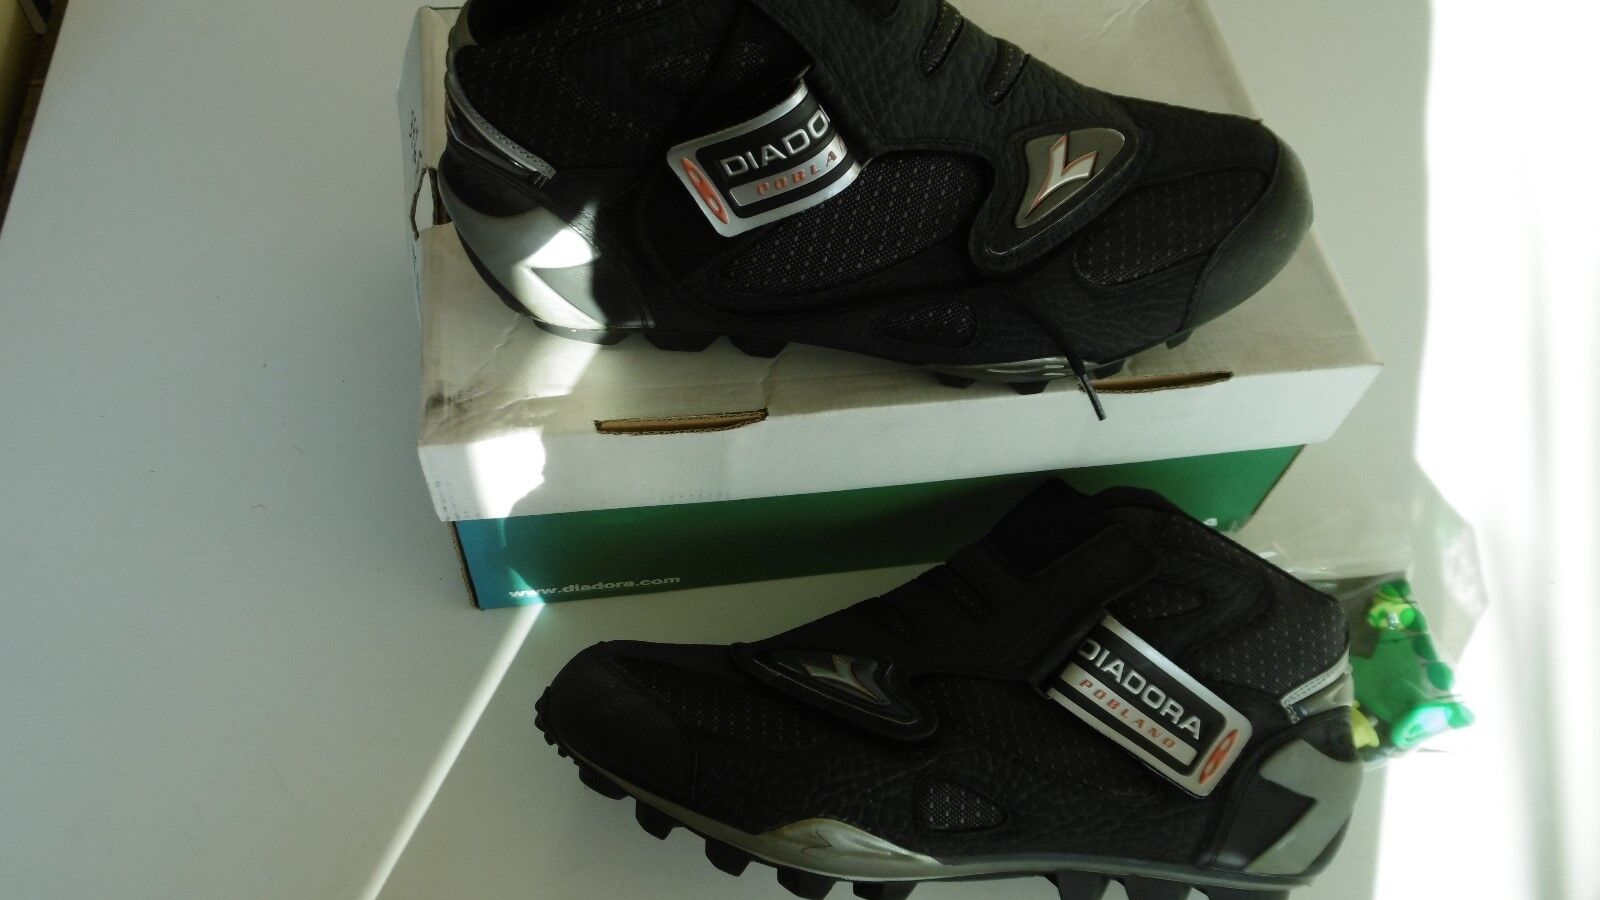 Diadora Pobland Black Shoes Size 46 New In Box